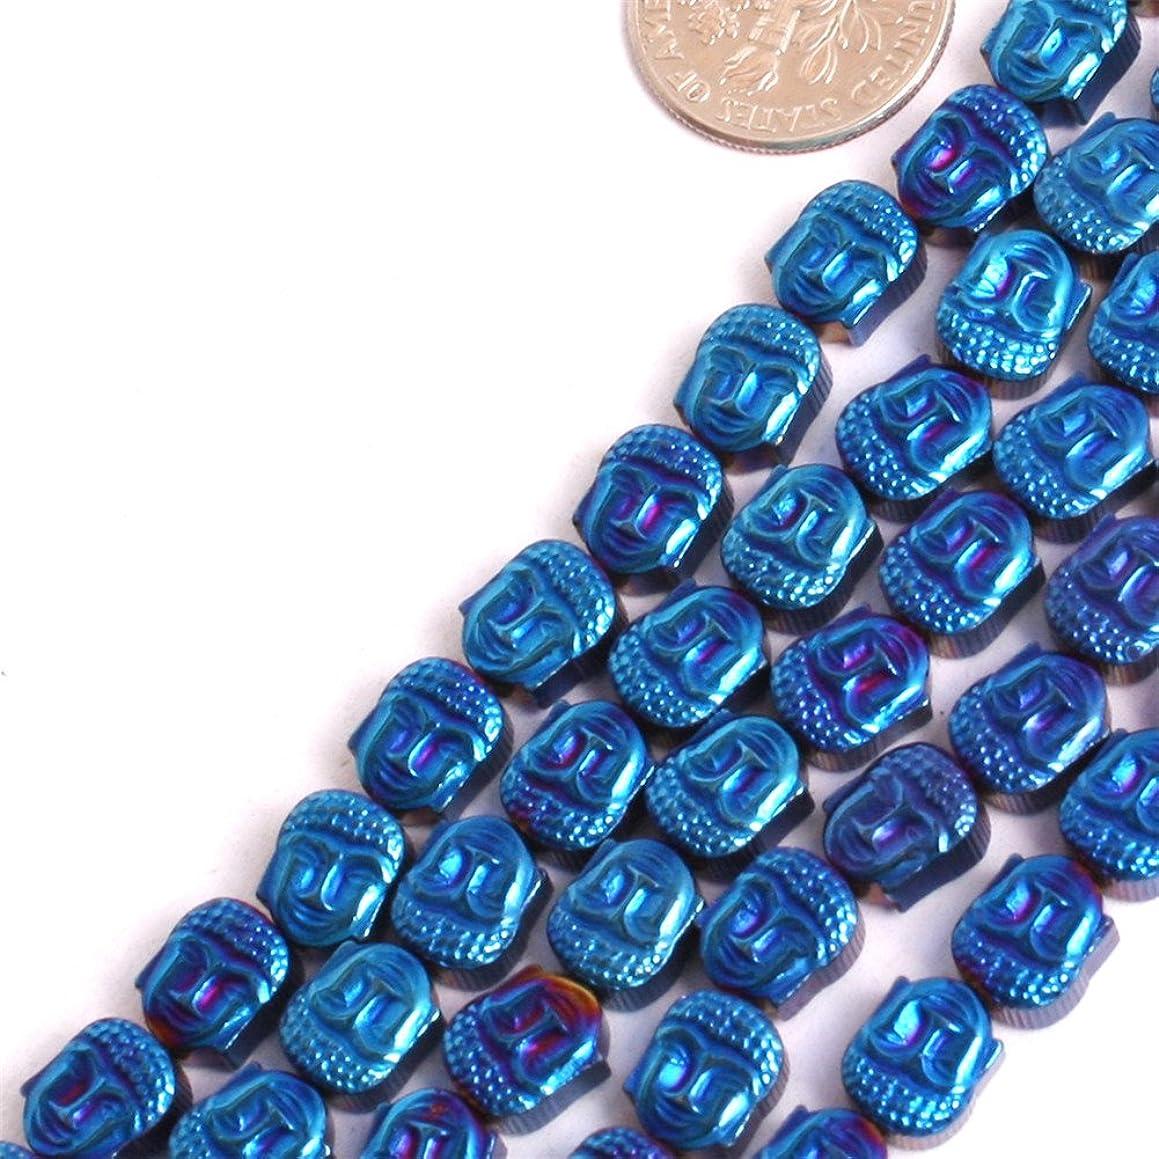 GEM-inside Hematite Gemstone Loose Beads Mala Buddha Blue Metallic Coated Crystal Energy Stone Power For Jewelry Making 15